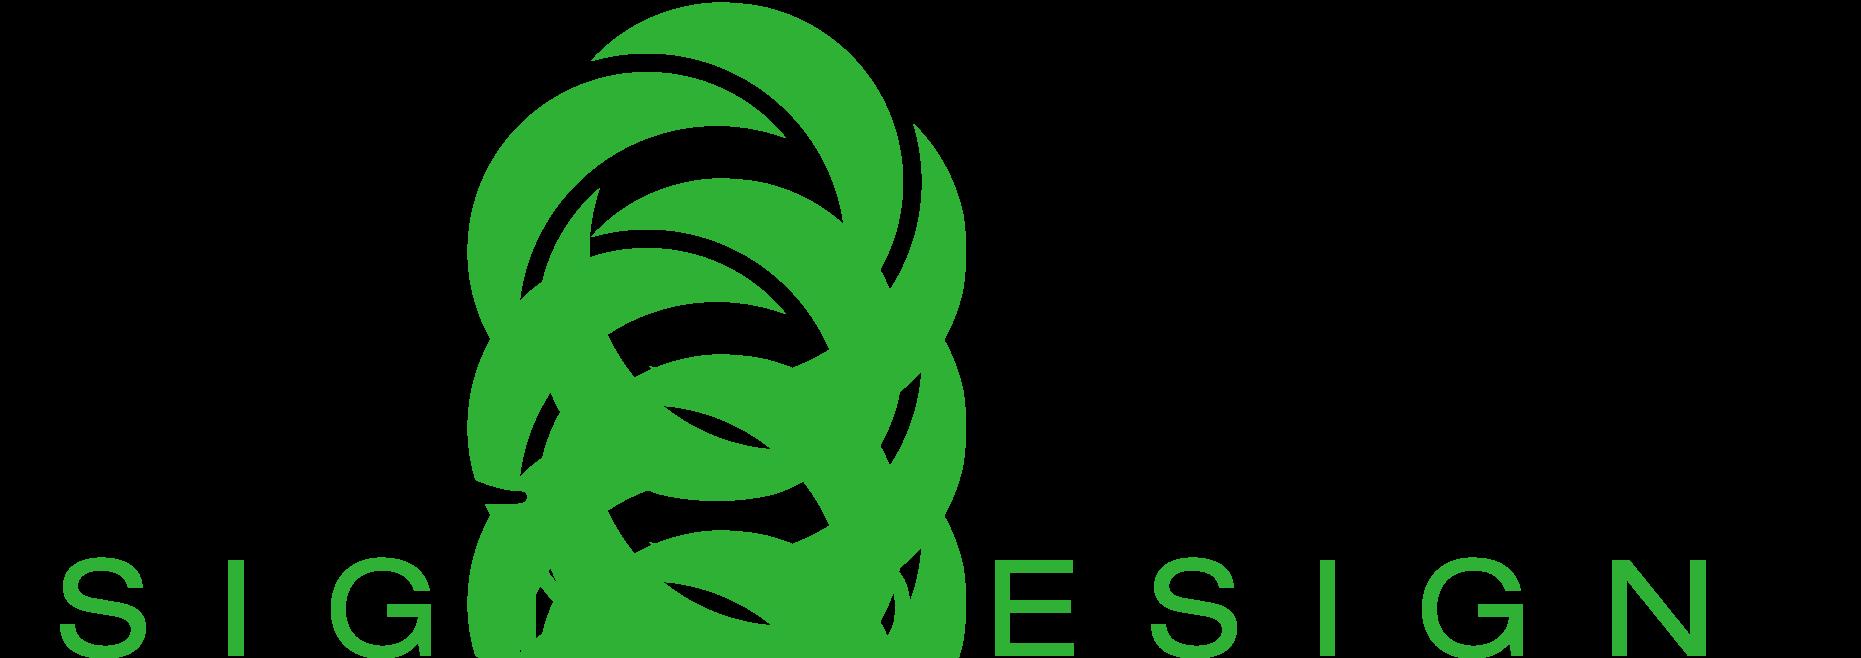 minneapolis-sign-design.jpg